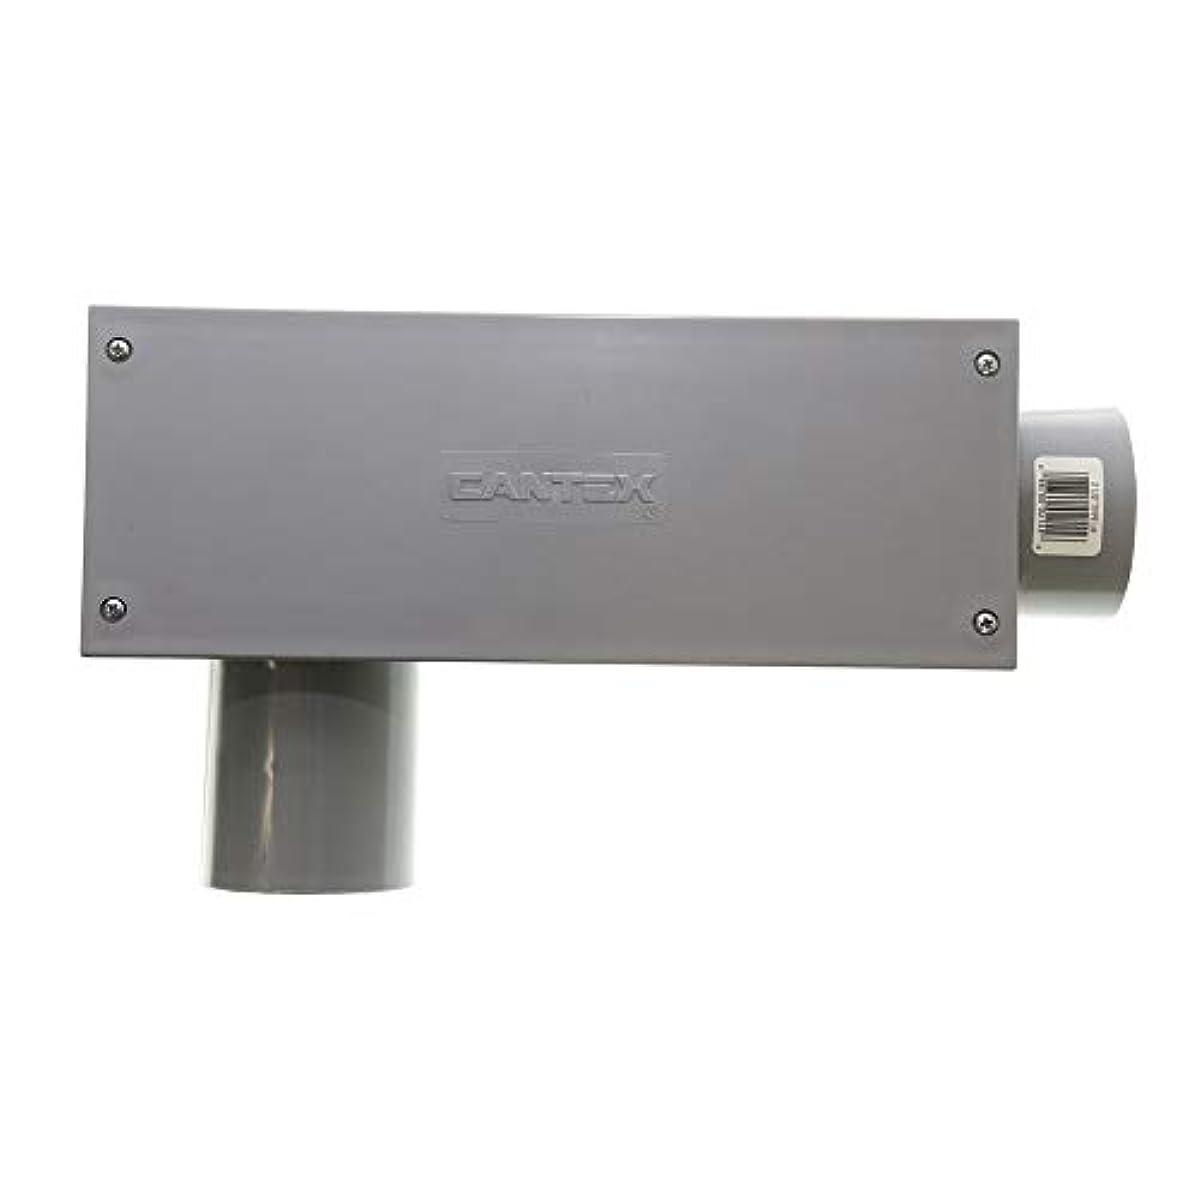 Cantex 5133658 Non-Metallic PVC Type-LR Conduit Access Body Fitting, 2-1/2-Inch